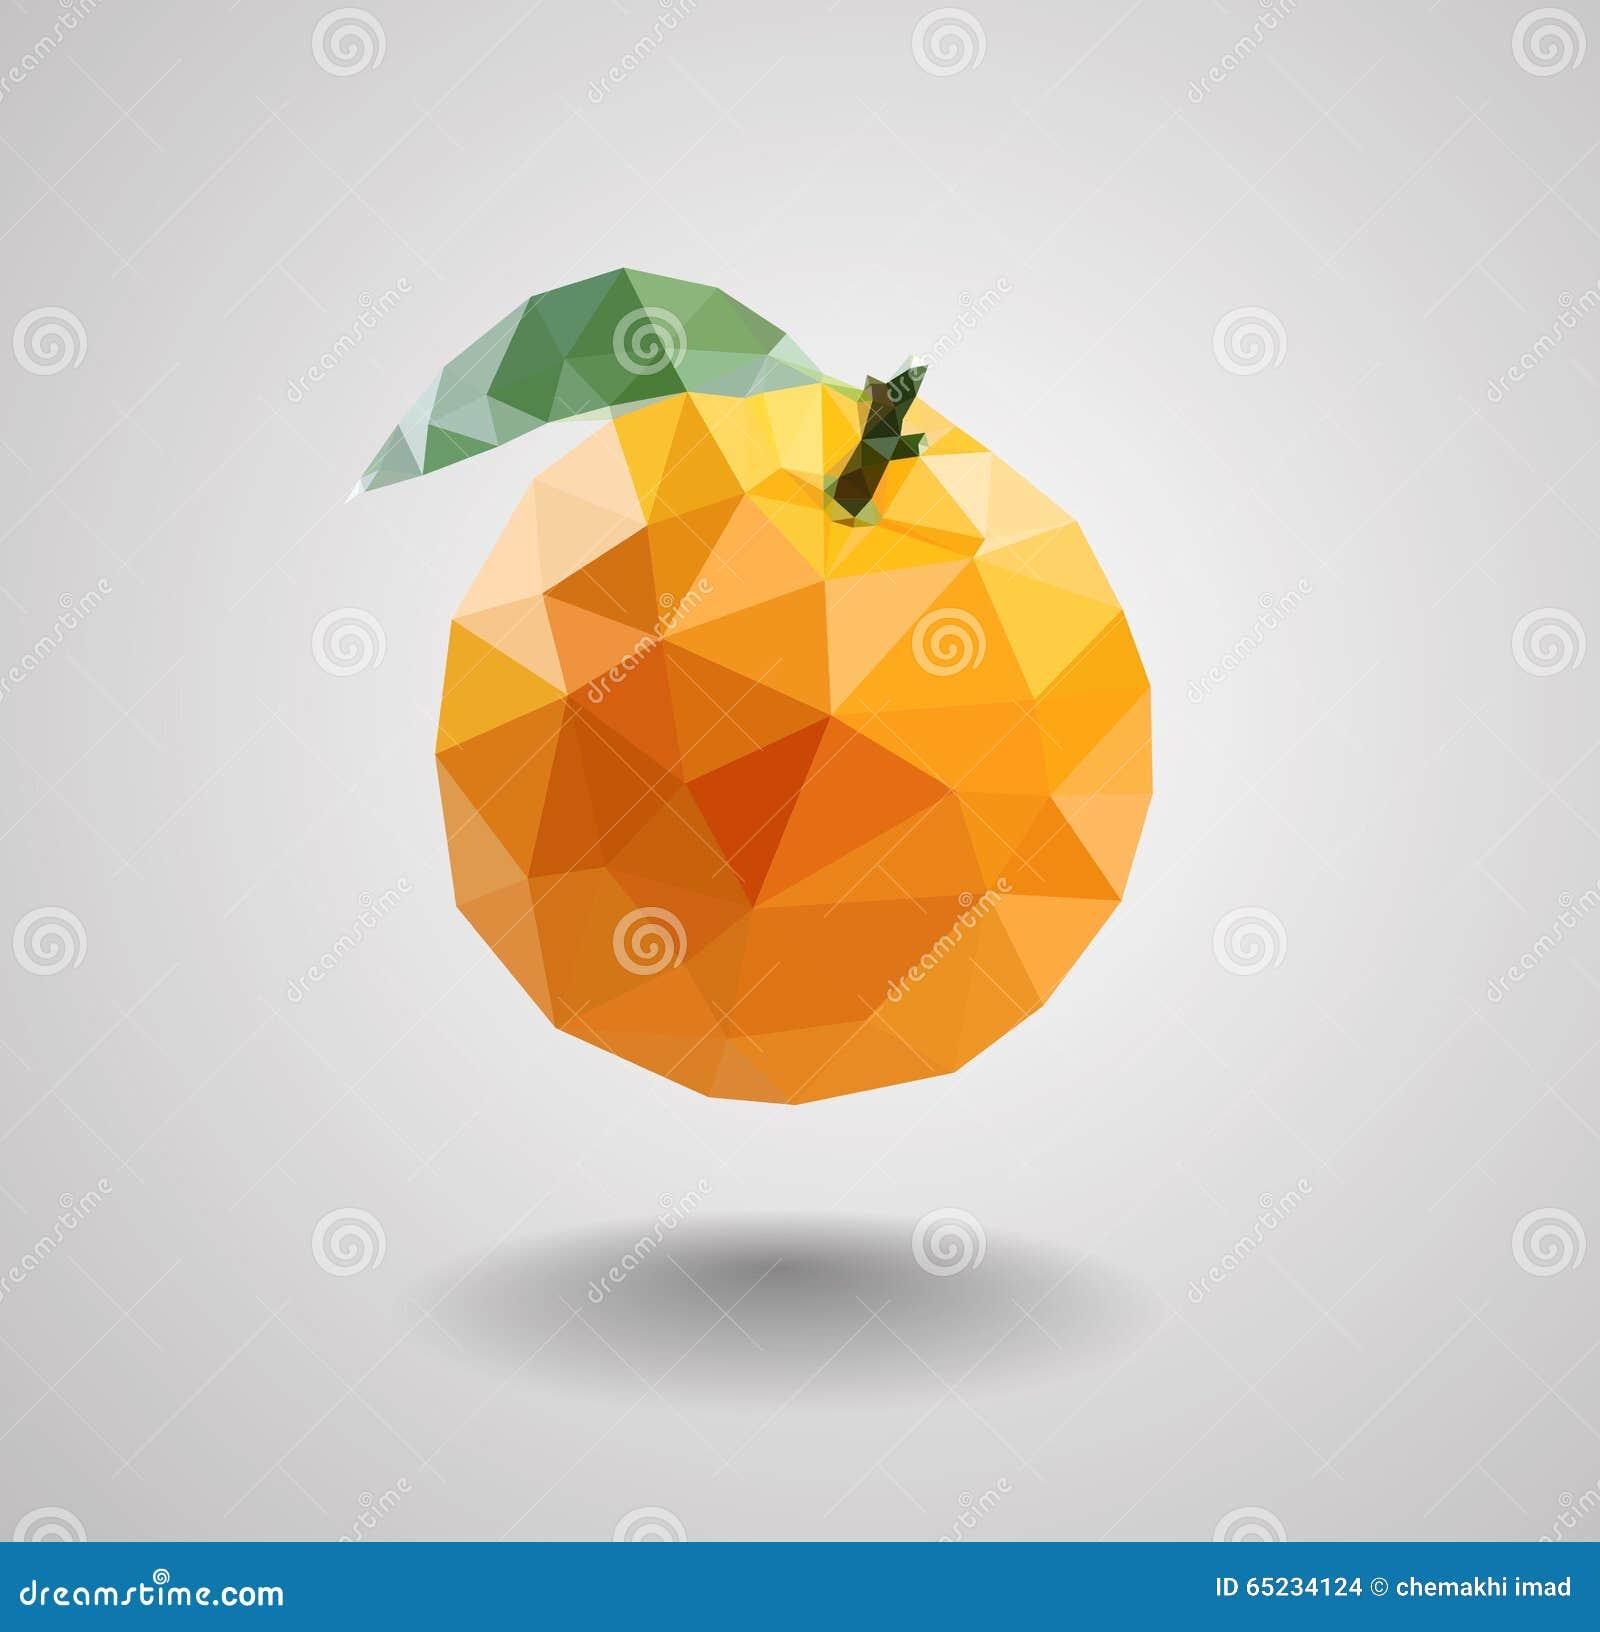 Orange Fruit In Polygons Style Stock Vector Illustration